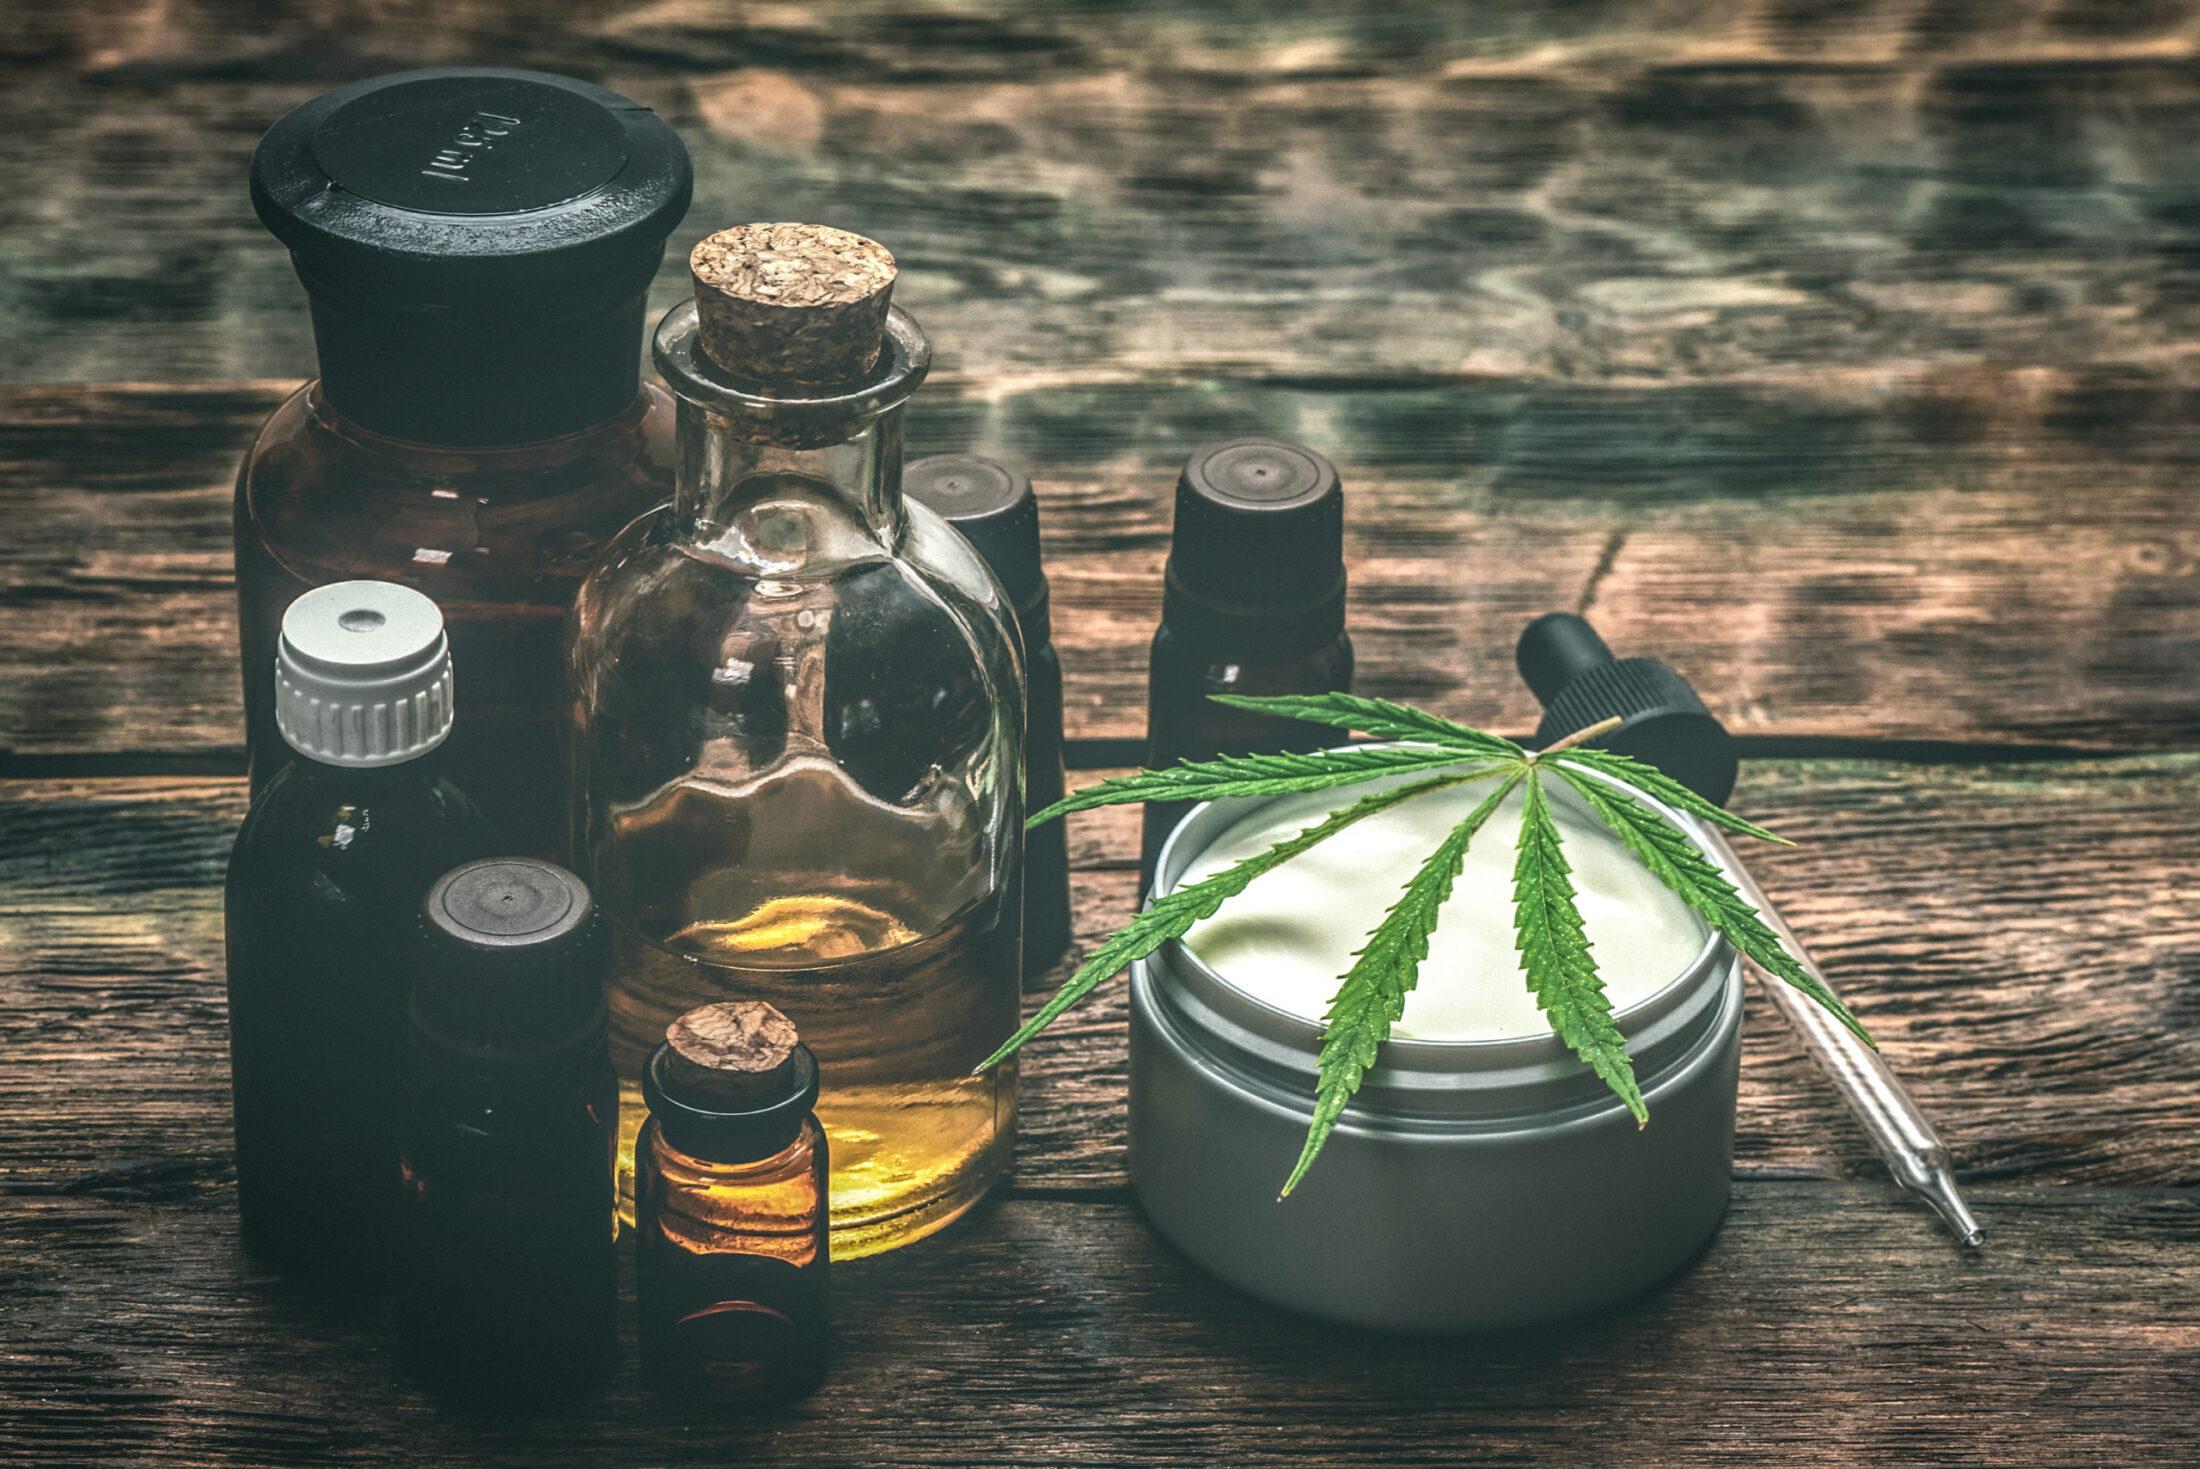 is weed legal in georgia